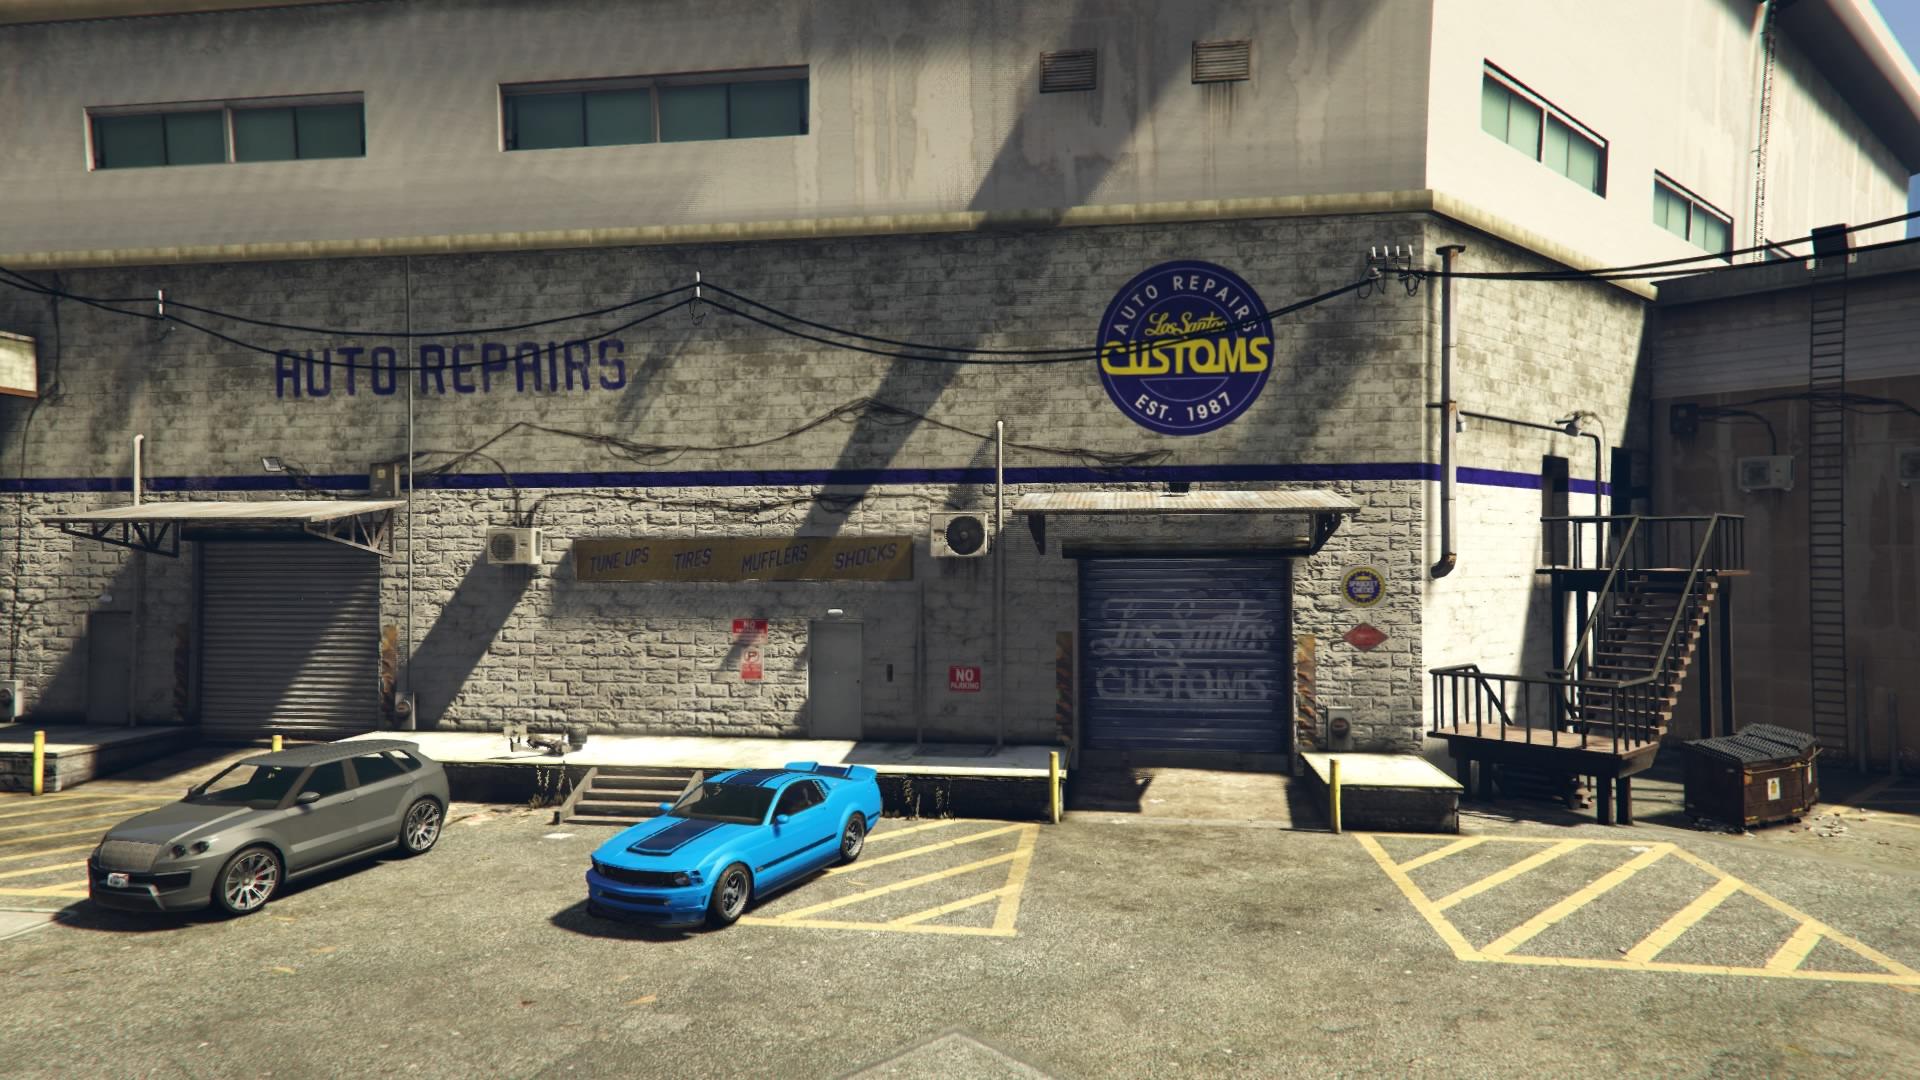 San garage gta andreas 5 of